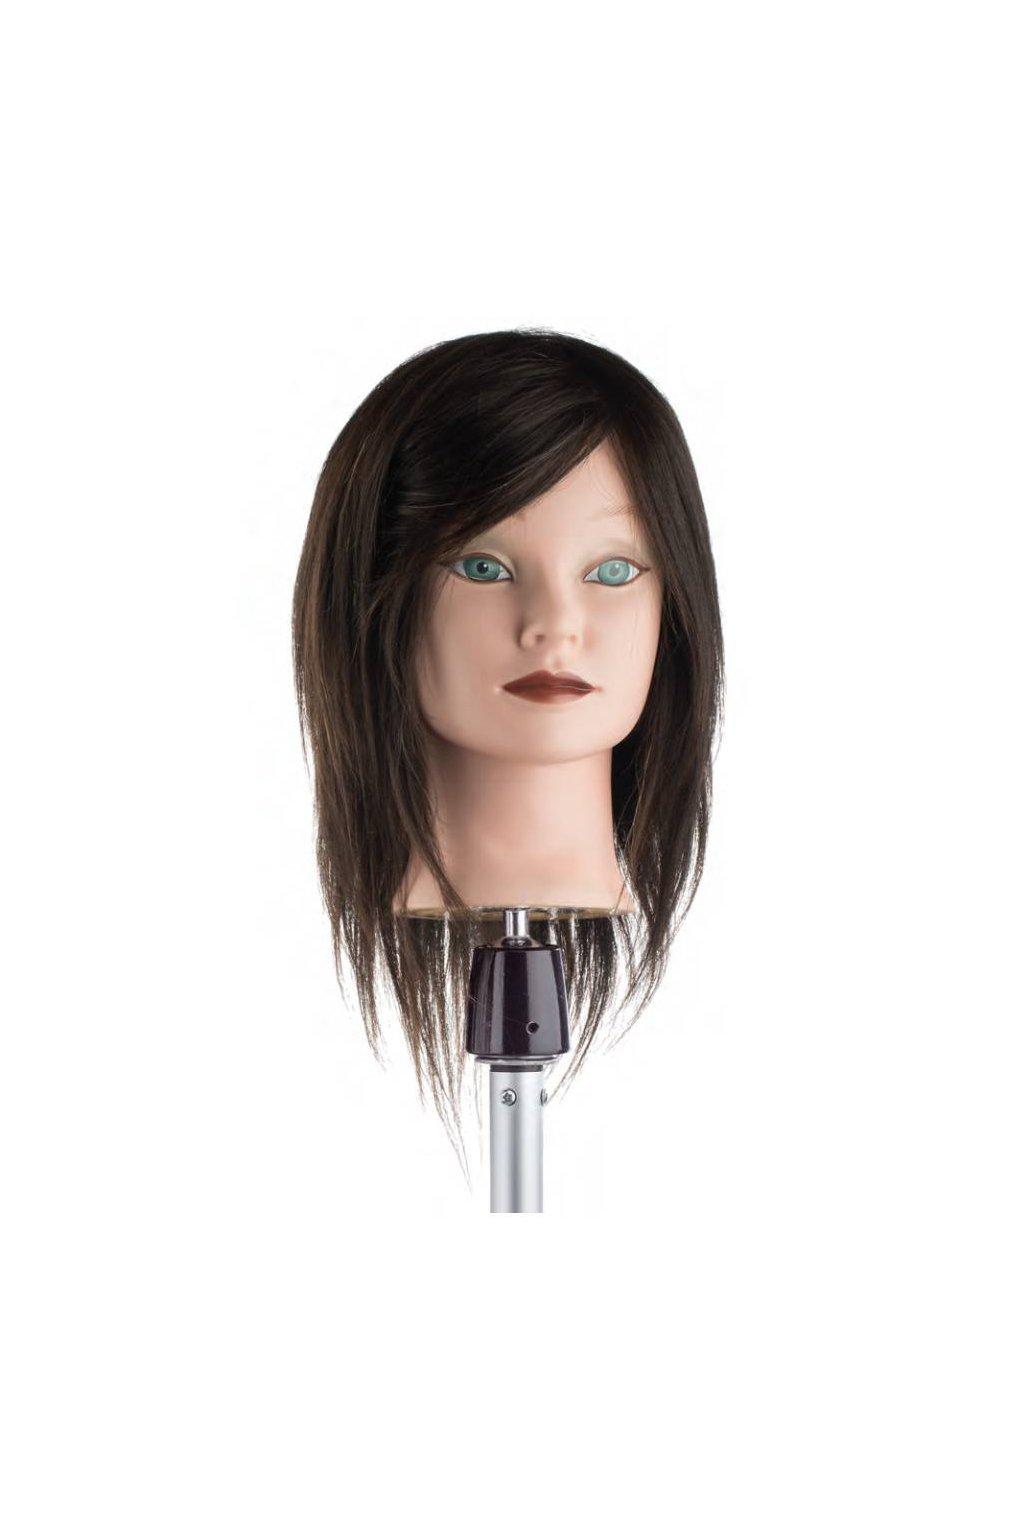 9984 cvicna hlava 100 lidske vlasy barva c 4 delka vlasu 25 30cm